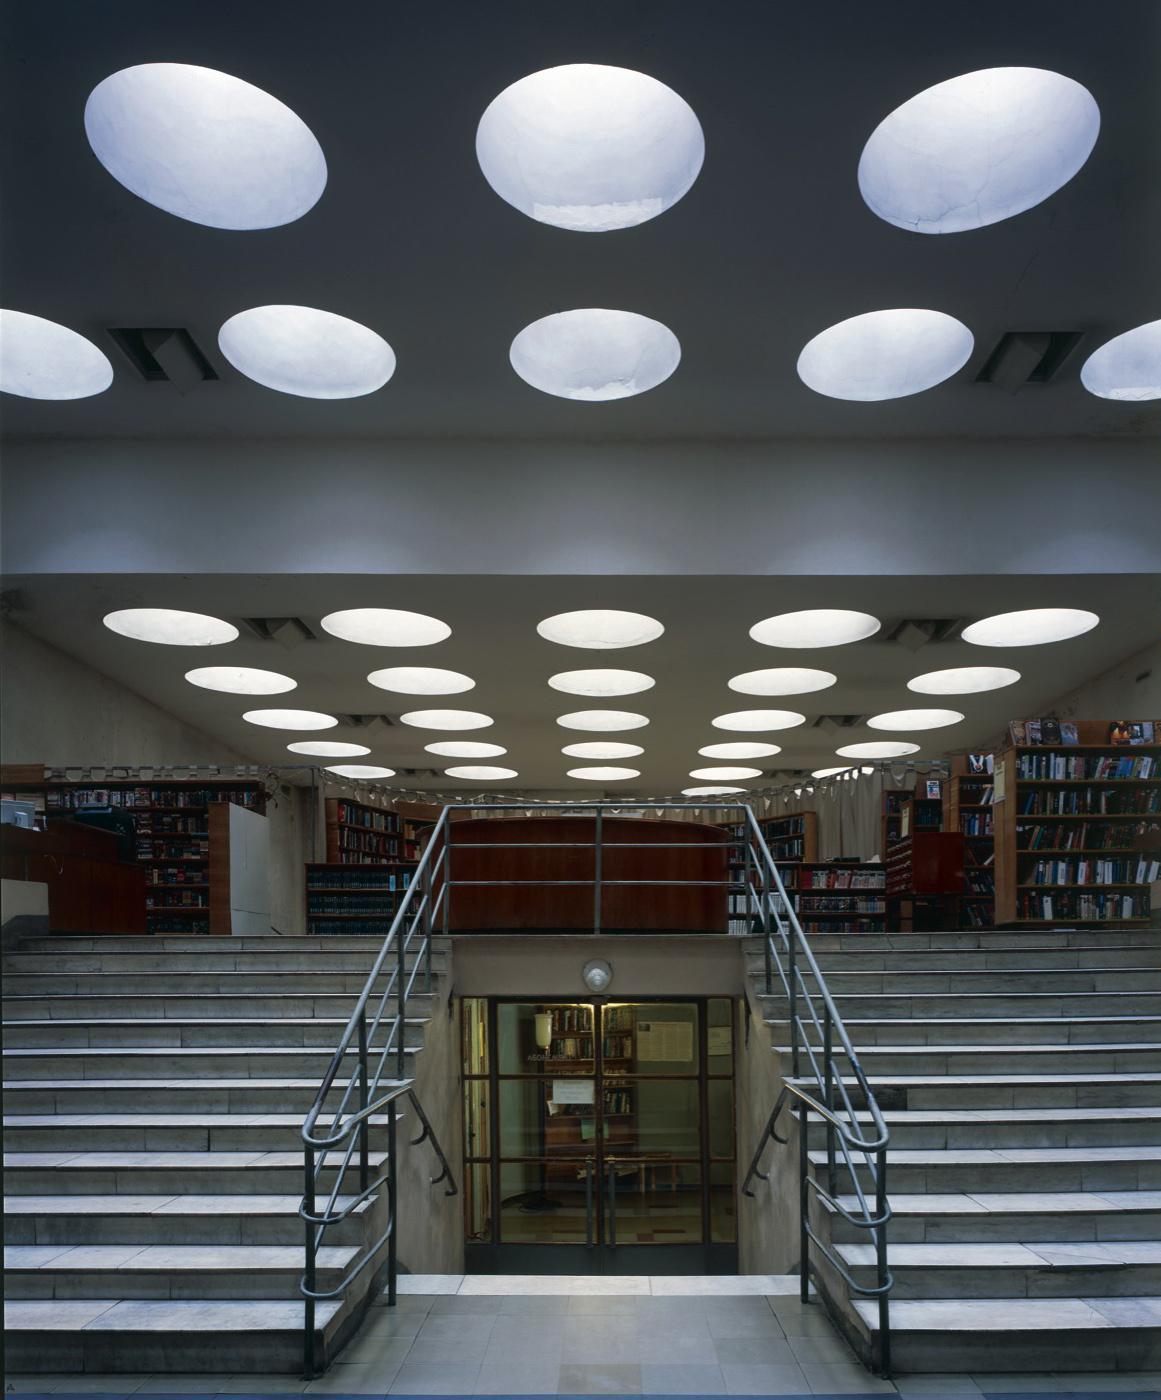 История дизайна: Айно и Алвар Аалто (галерея 13, фото 4)